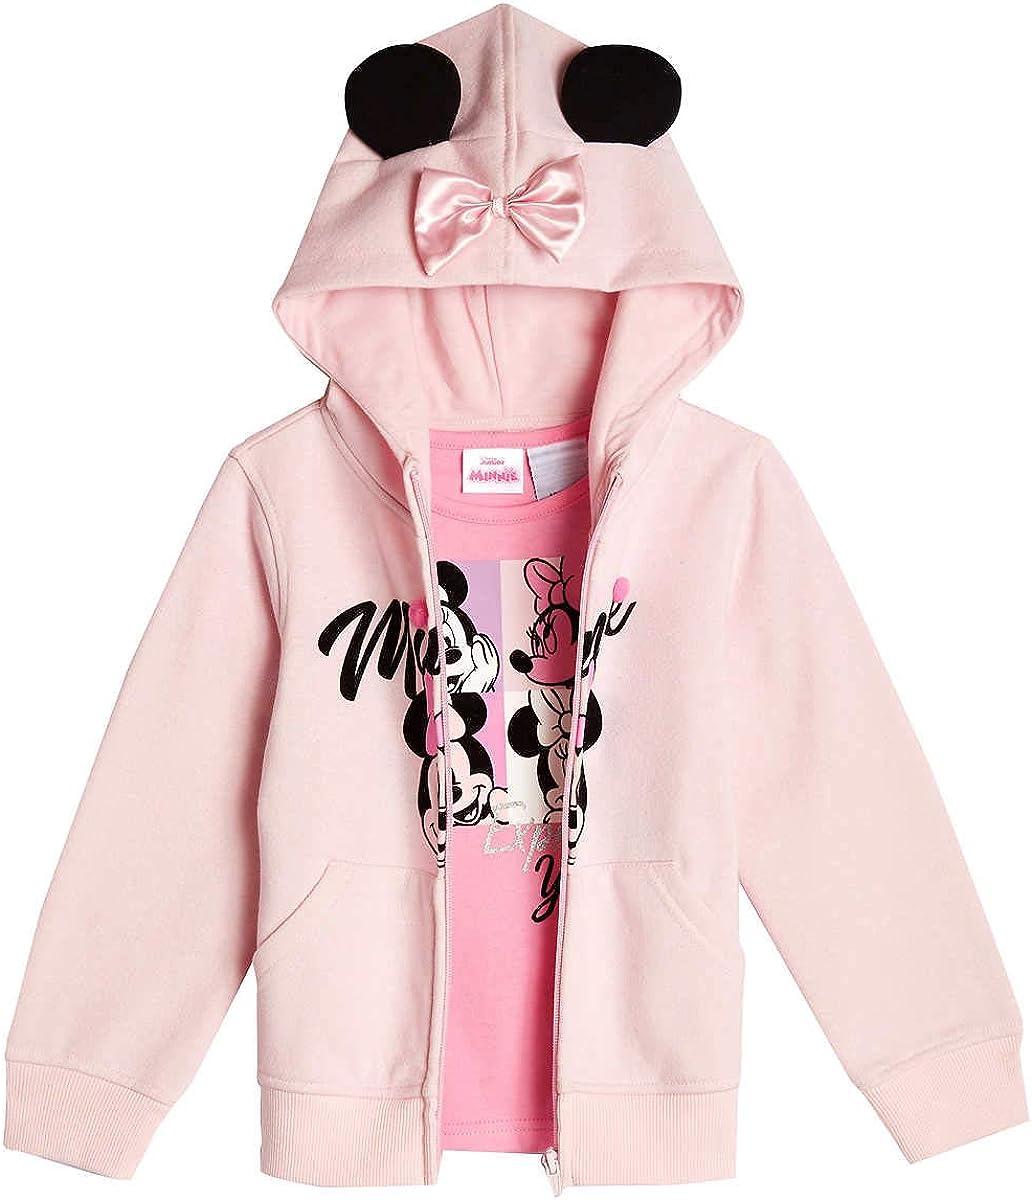 Disney Girls Outlet sale feature 2 Seasonal Wrap Introduction Piece Set Fleece Jacket Shirt Hoodie Tee with